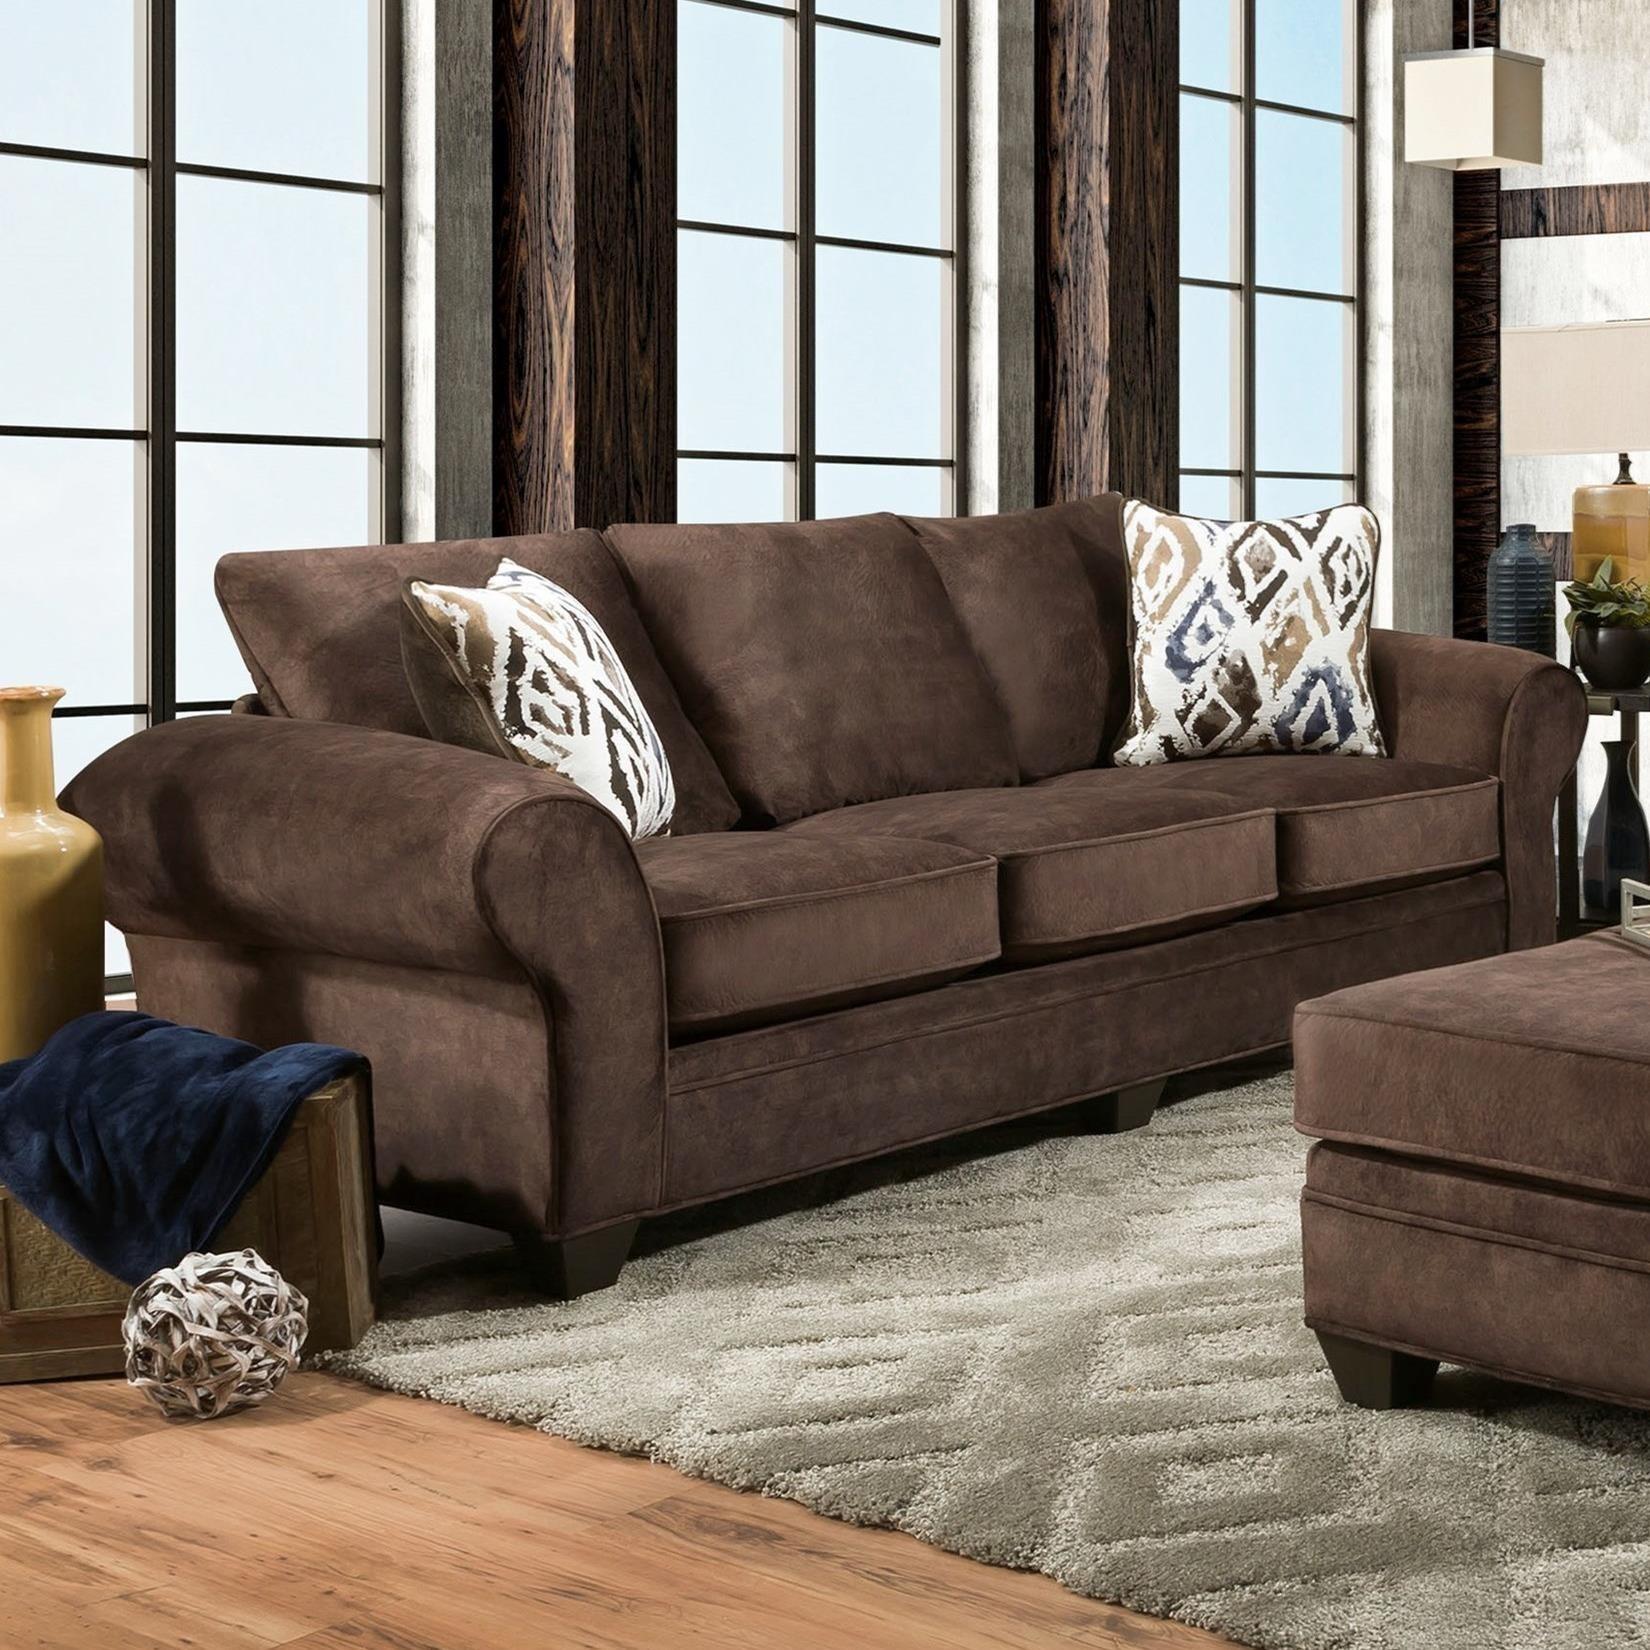 3760 Sofa by Peak Living at Prime Brothers Furniture